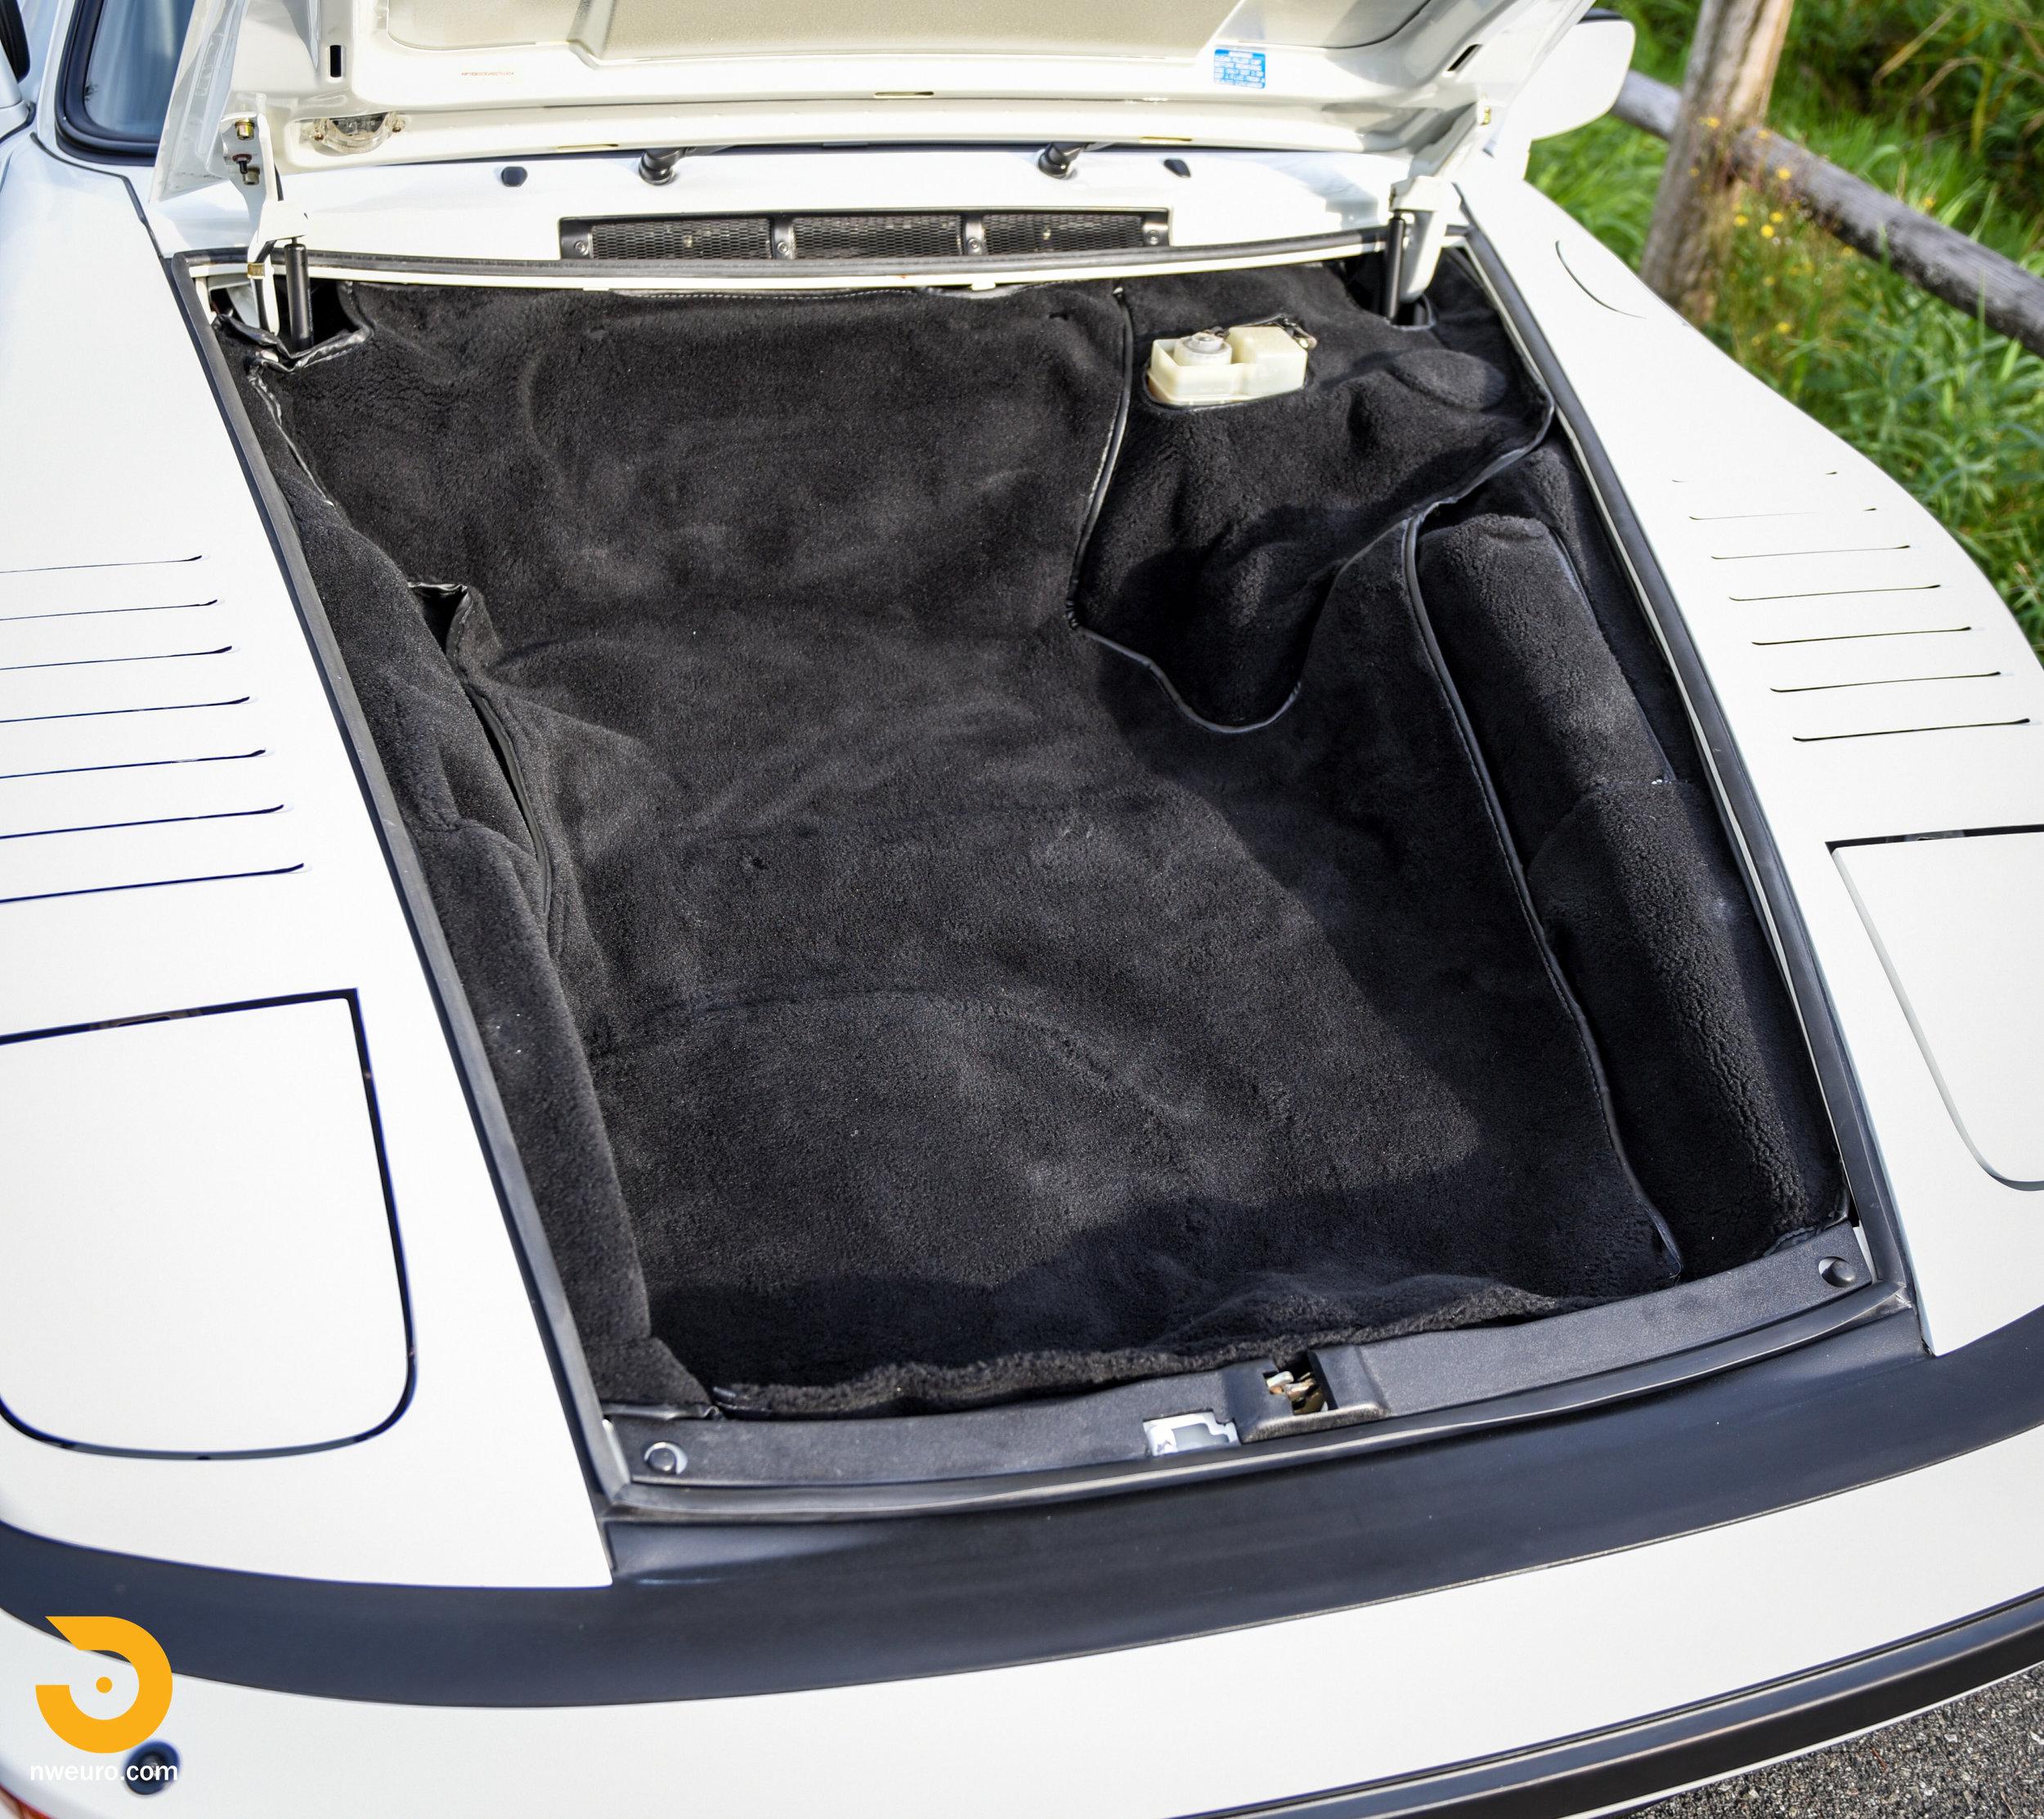 1987 Porsche 930 Slant Nose Cab-23.jpg